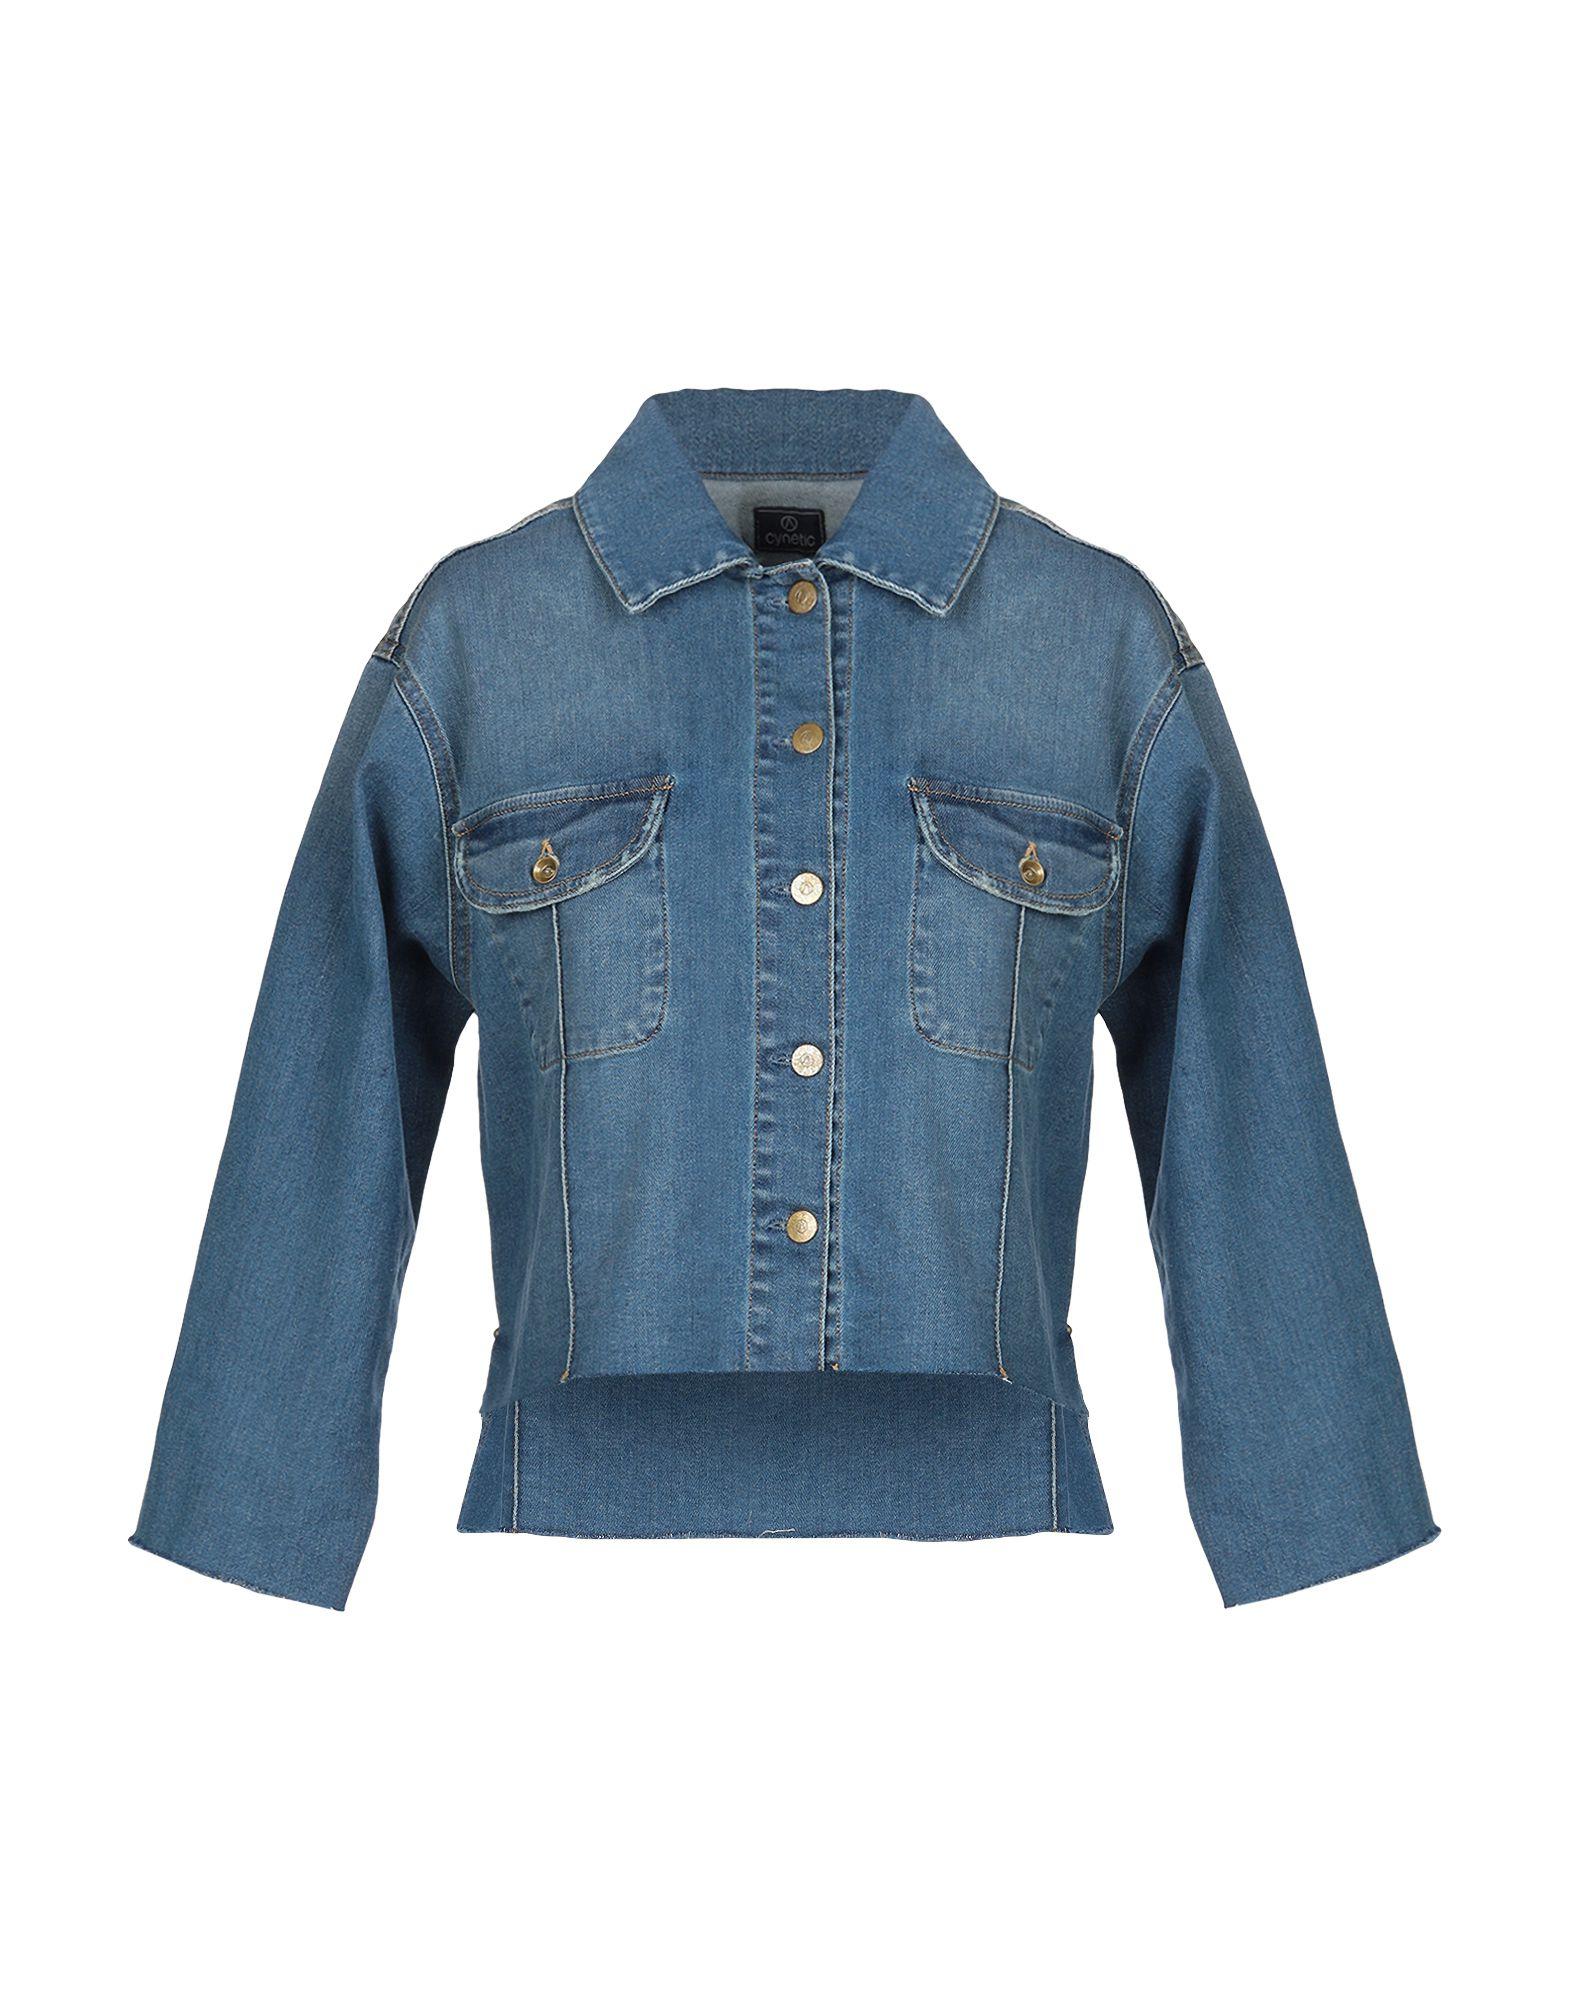 Acynetic Denim Jacket In Blue